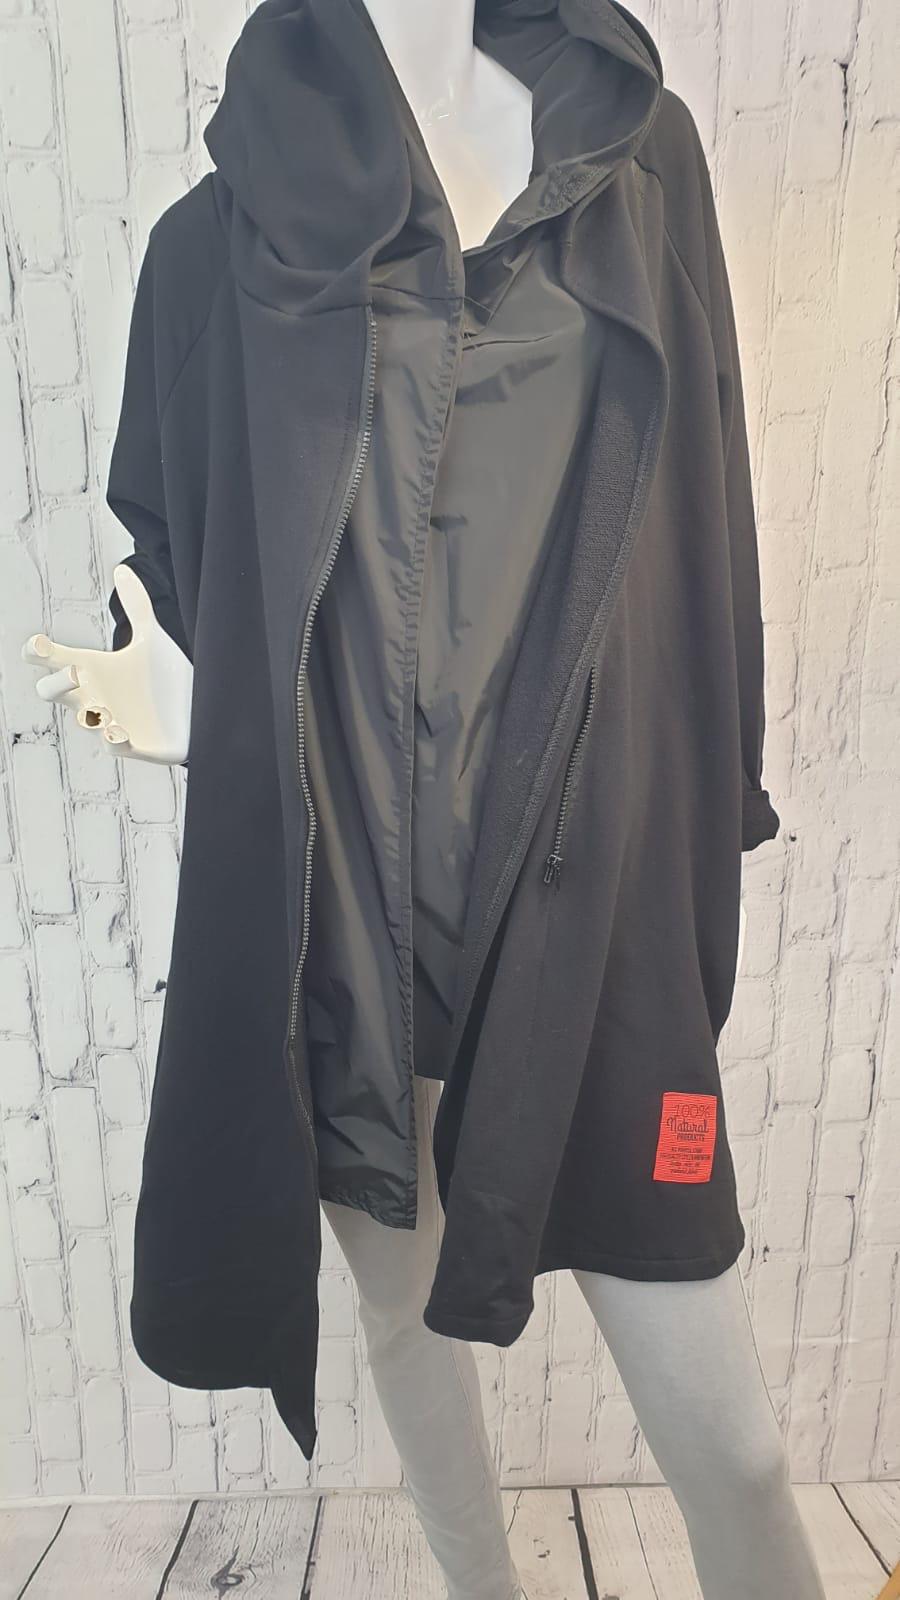 BILLI Hooded Zipped Cardigan/Jacket